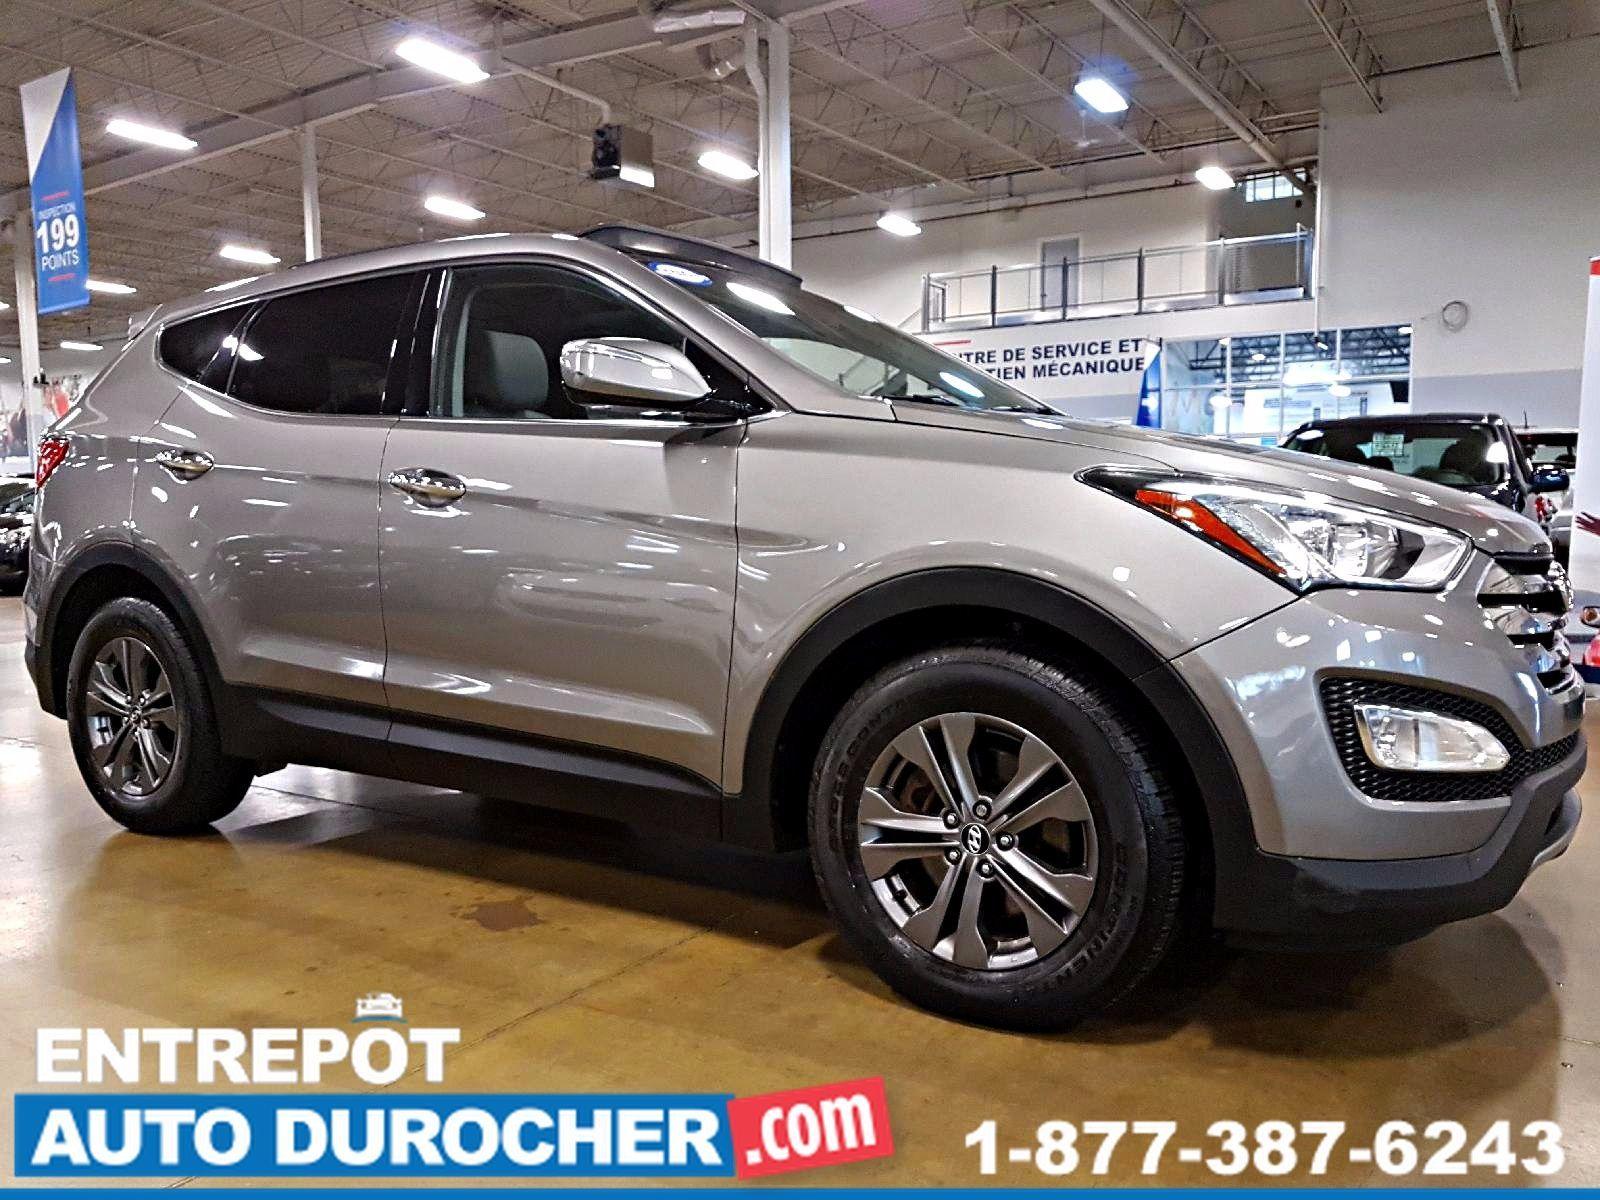 2013 Hyundai Santa Fe LUXURY - AWD - AUTOMATIQUE - AIR CLIMATISÉ